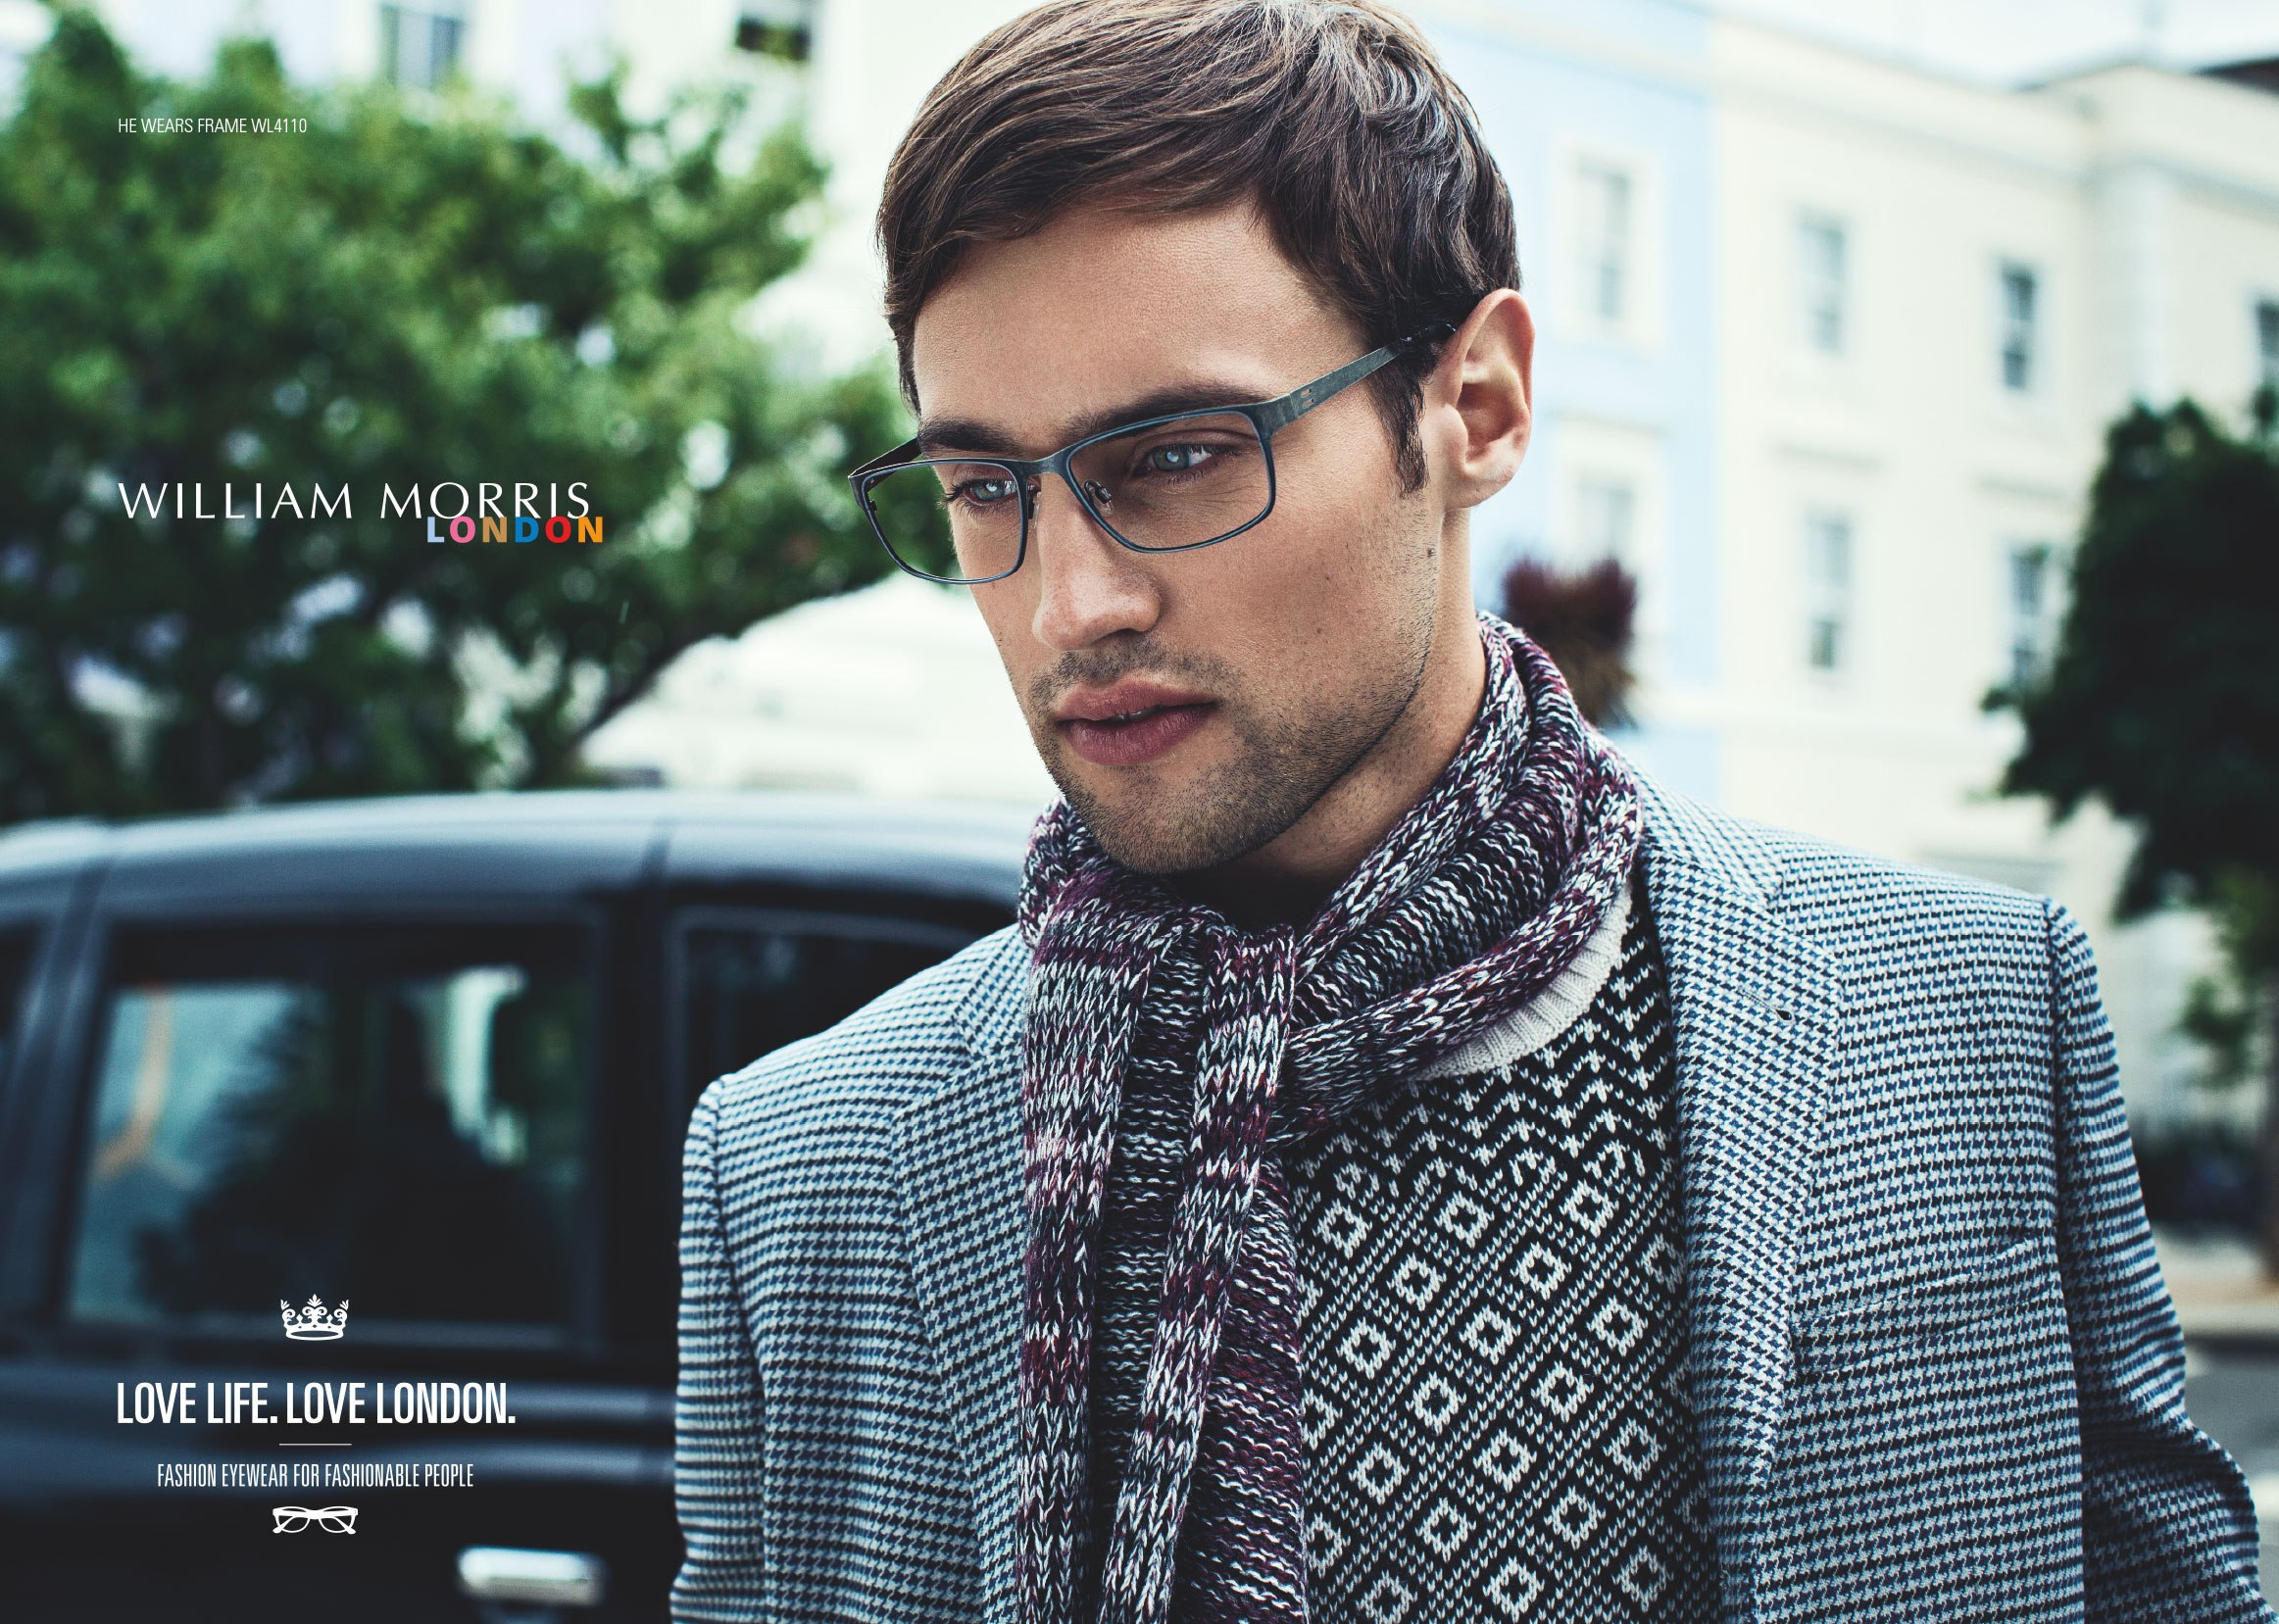 william-morris-london-2013-campaign-glasses-eyewear-3